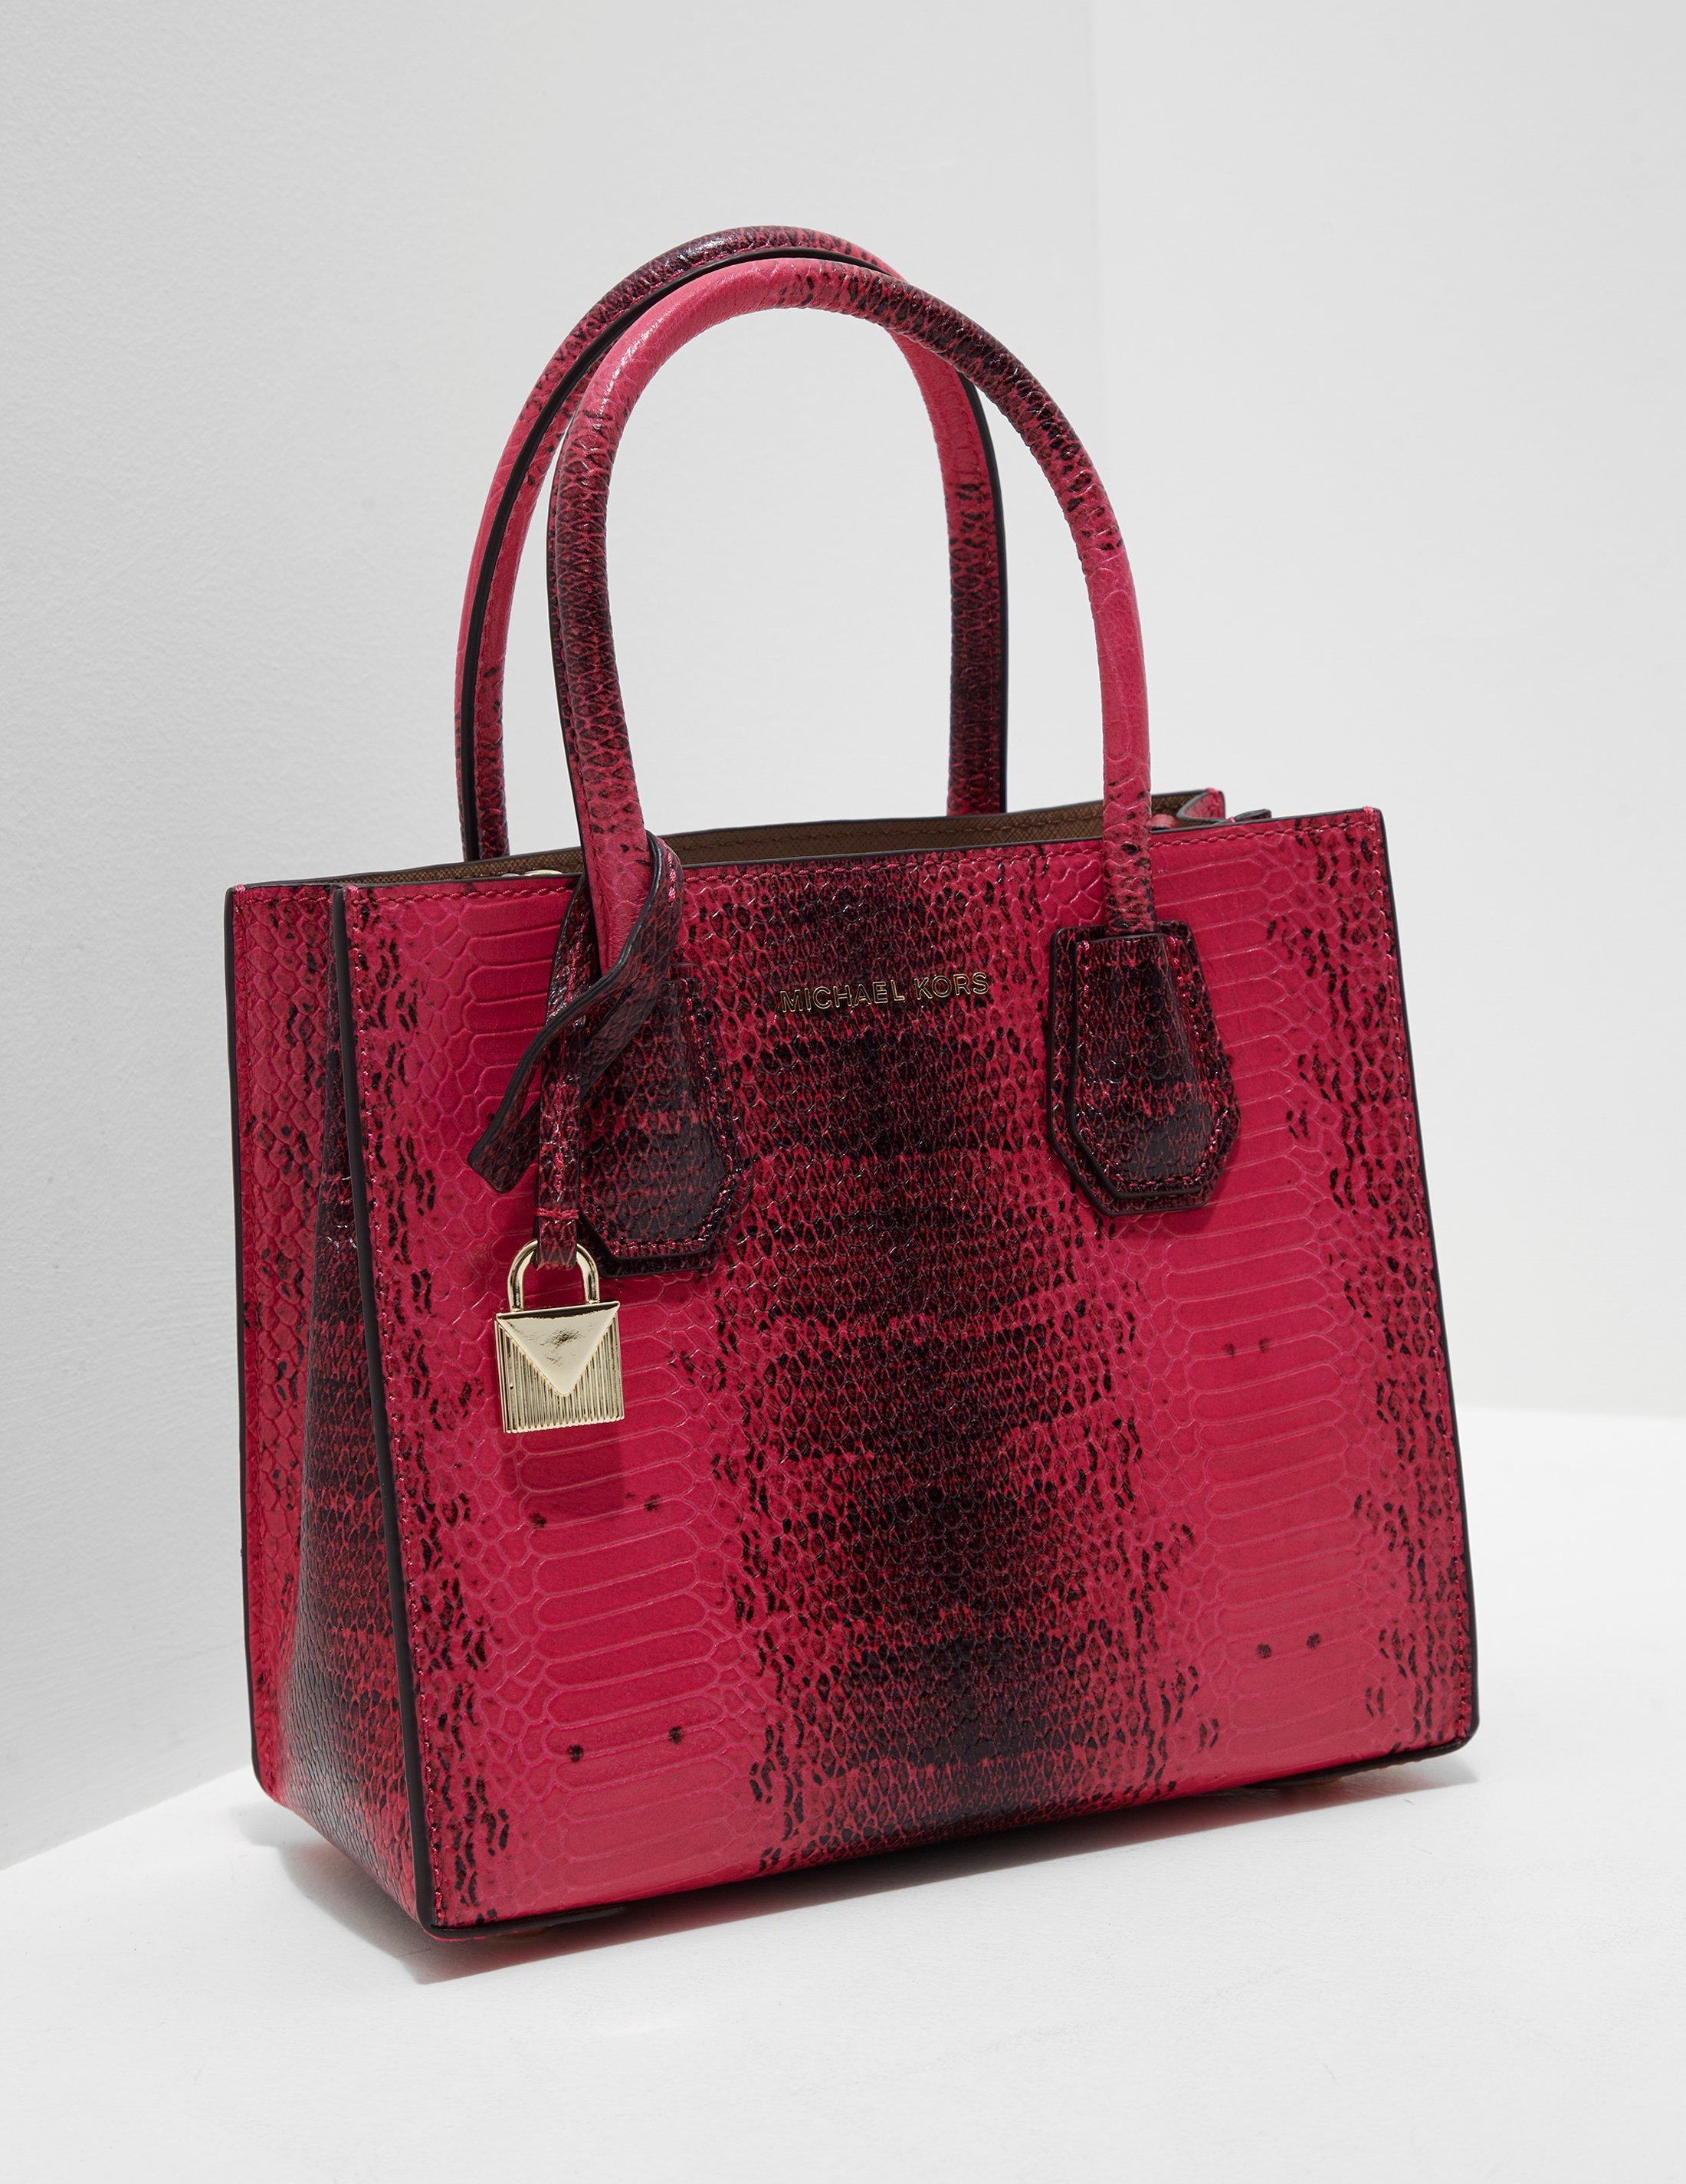 45526ea66e Michael Kors Womens Mercer Messenger Bag - Online Exclusive Pink in ...